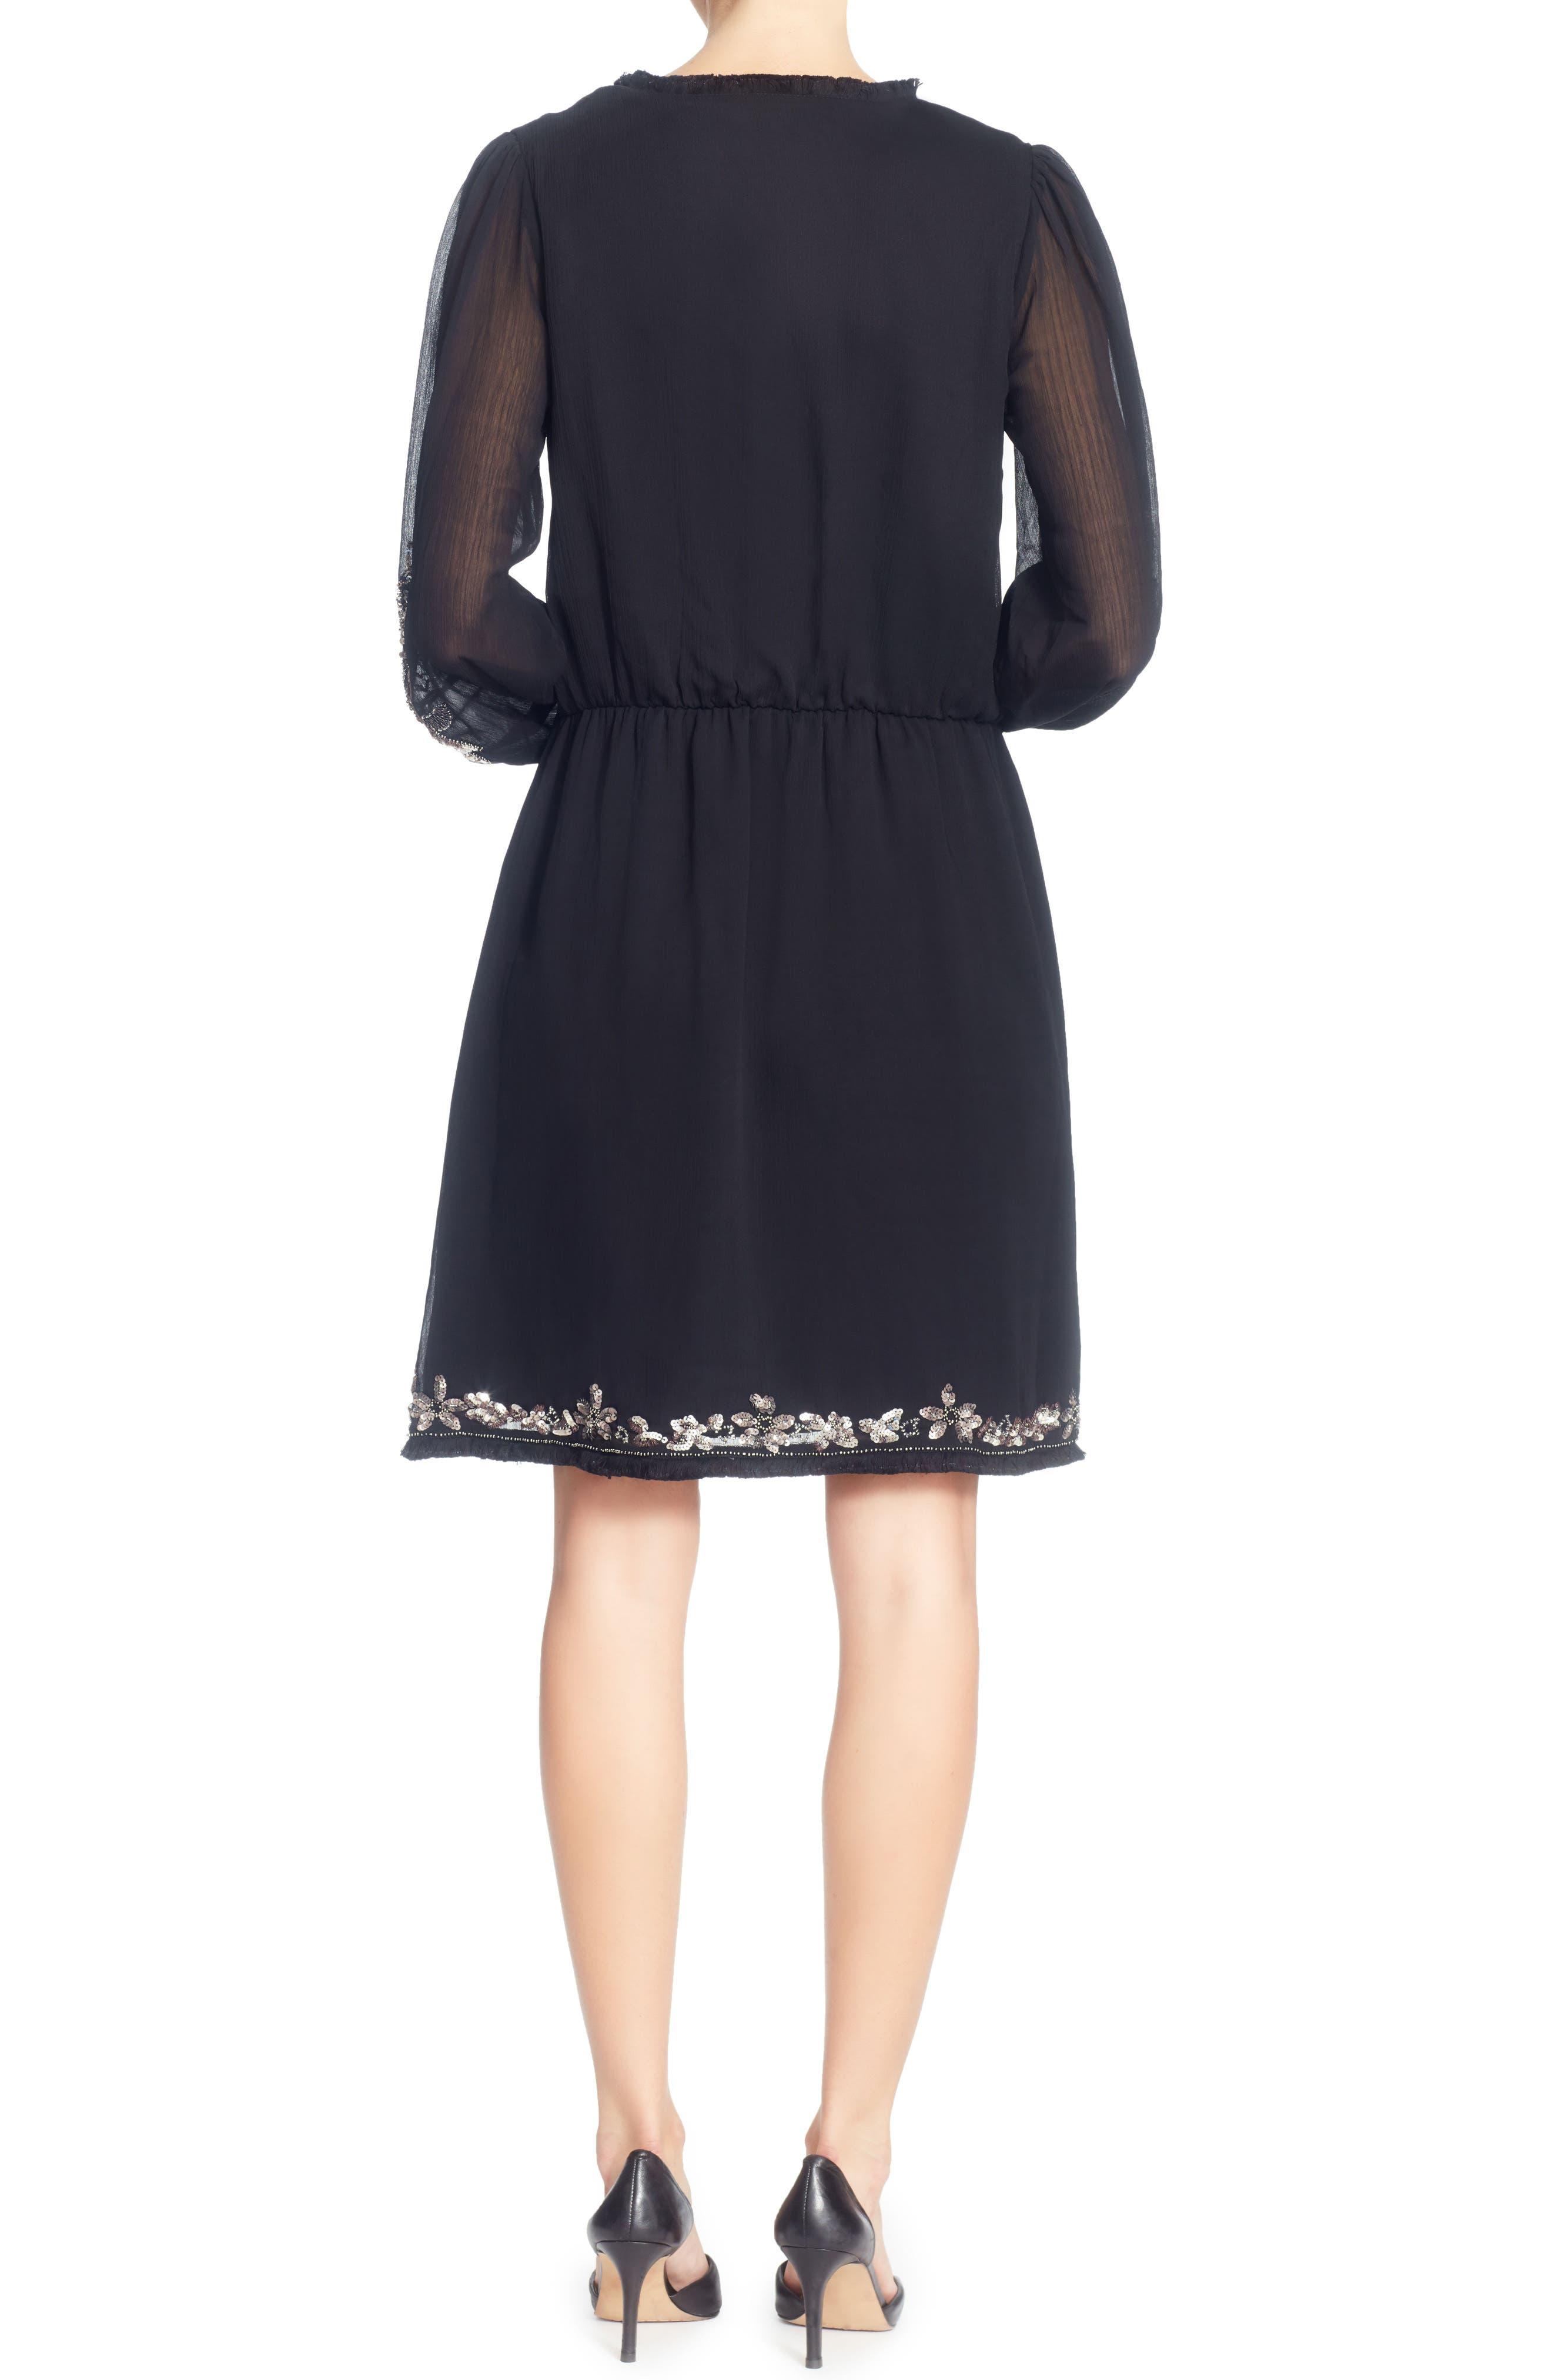 Gretl Dress,                             Alternate thumbnail 2, color,